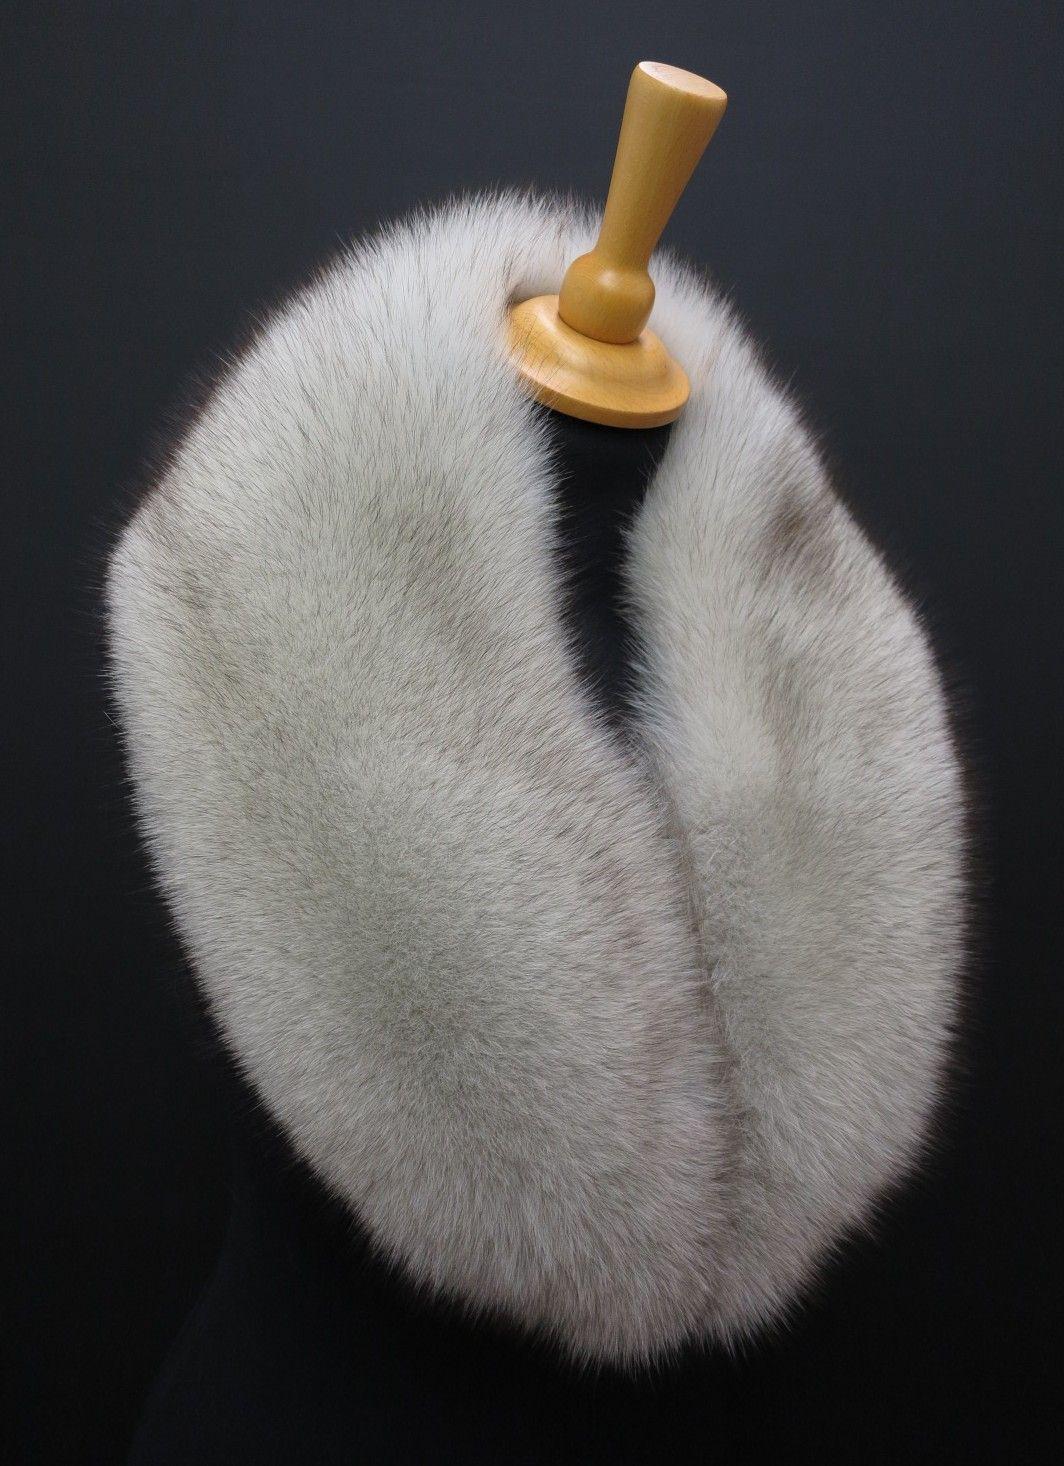 ad628769459 Luxusní kožešinový límec z polární lišky  realfur  kozesina  limec   kozesinovy  spongr